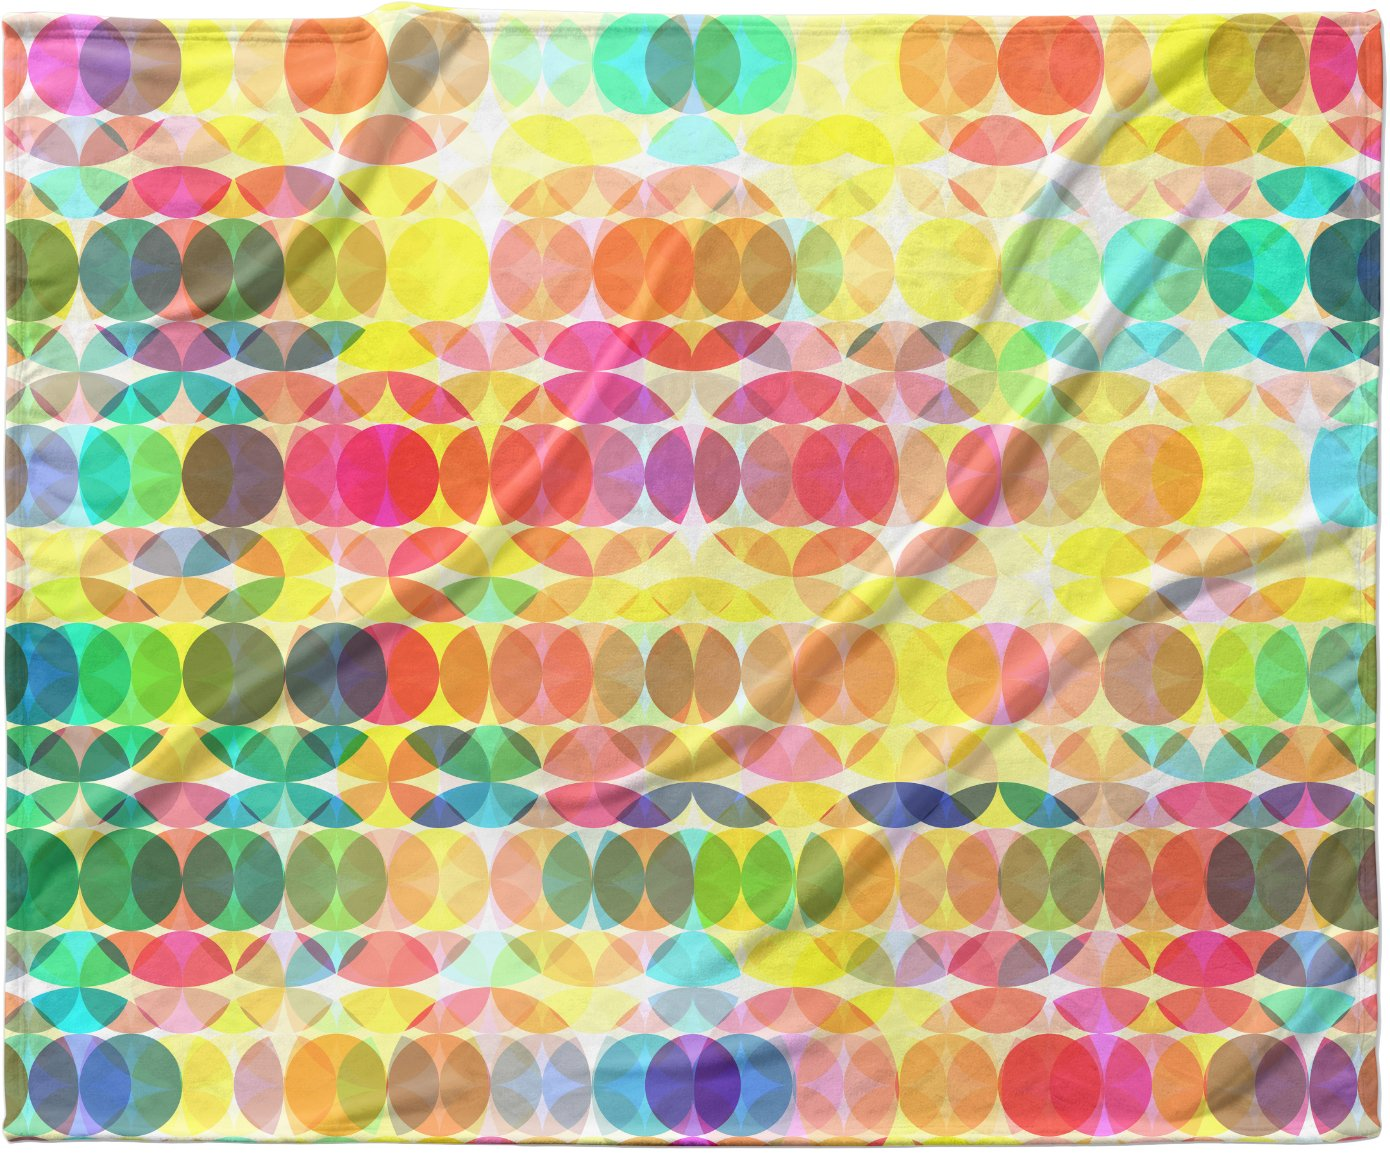 KESS InHouse Fimbis 'SercuelarToo' Geometric Circles, 30' x 40' Fleece Baby Blanket, 40' x 30'